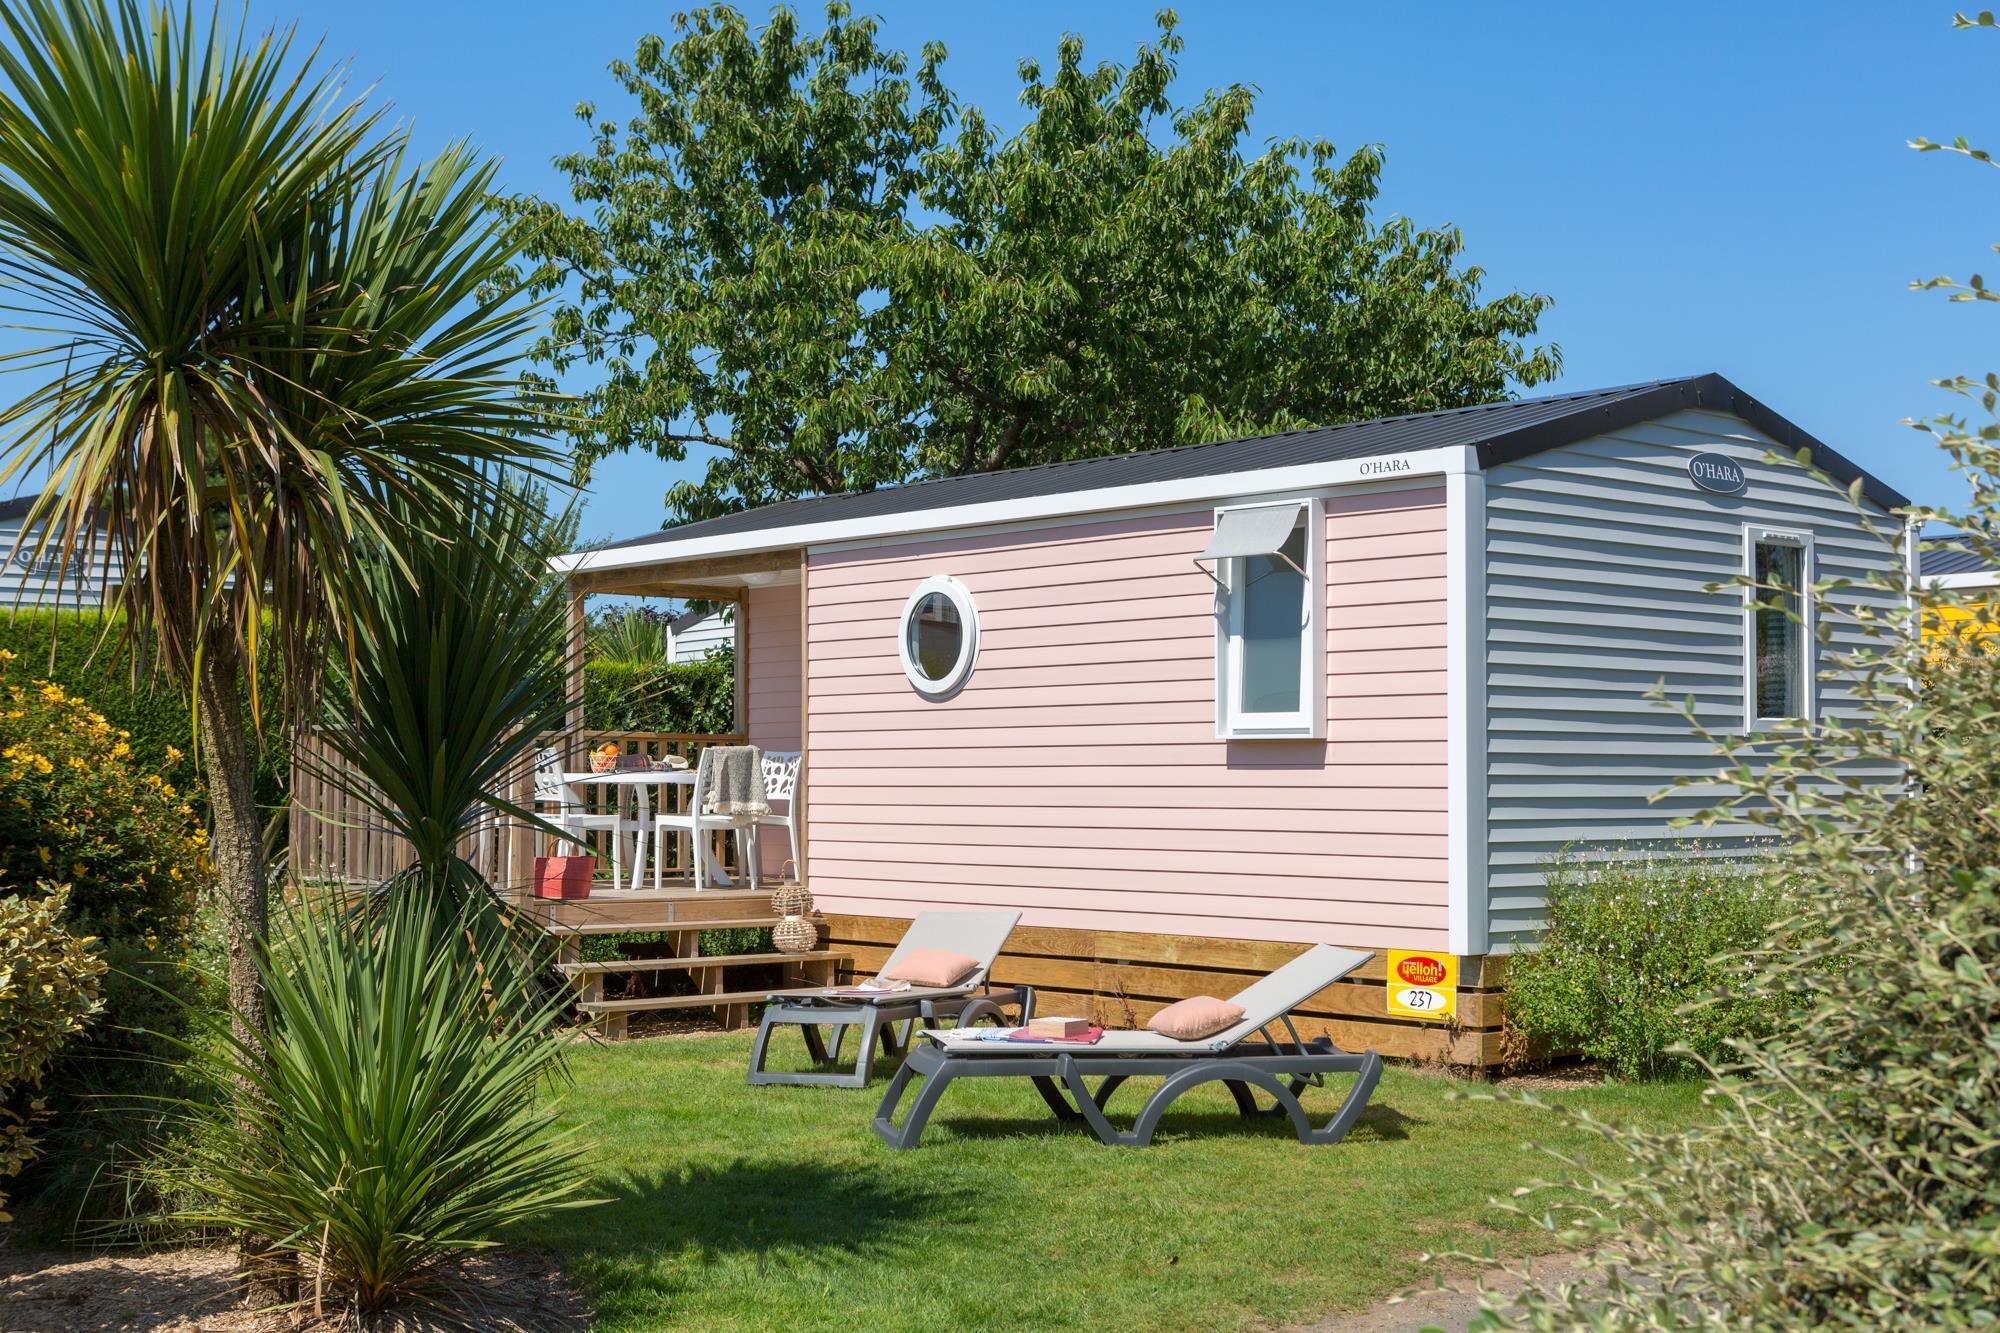 Location - Cottage*** (2 Chambres) - Terrasse Couverte - Yelloh! Village L'Océan Breton